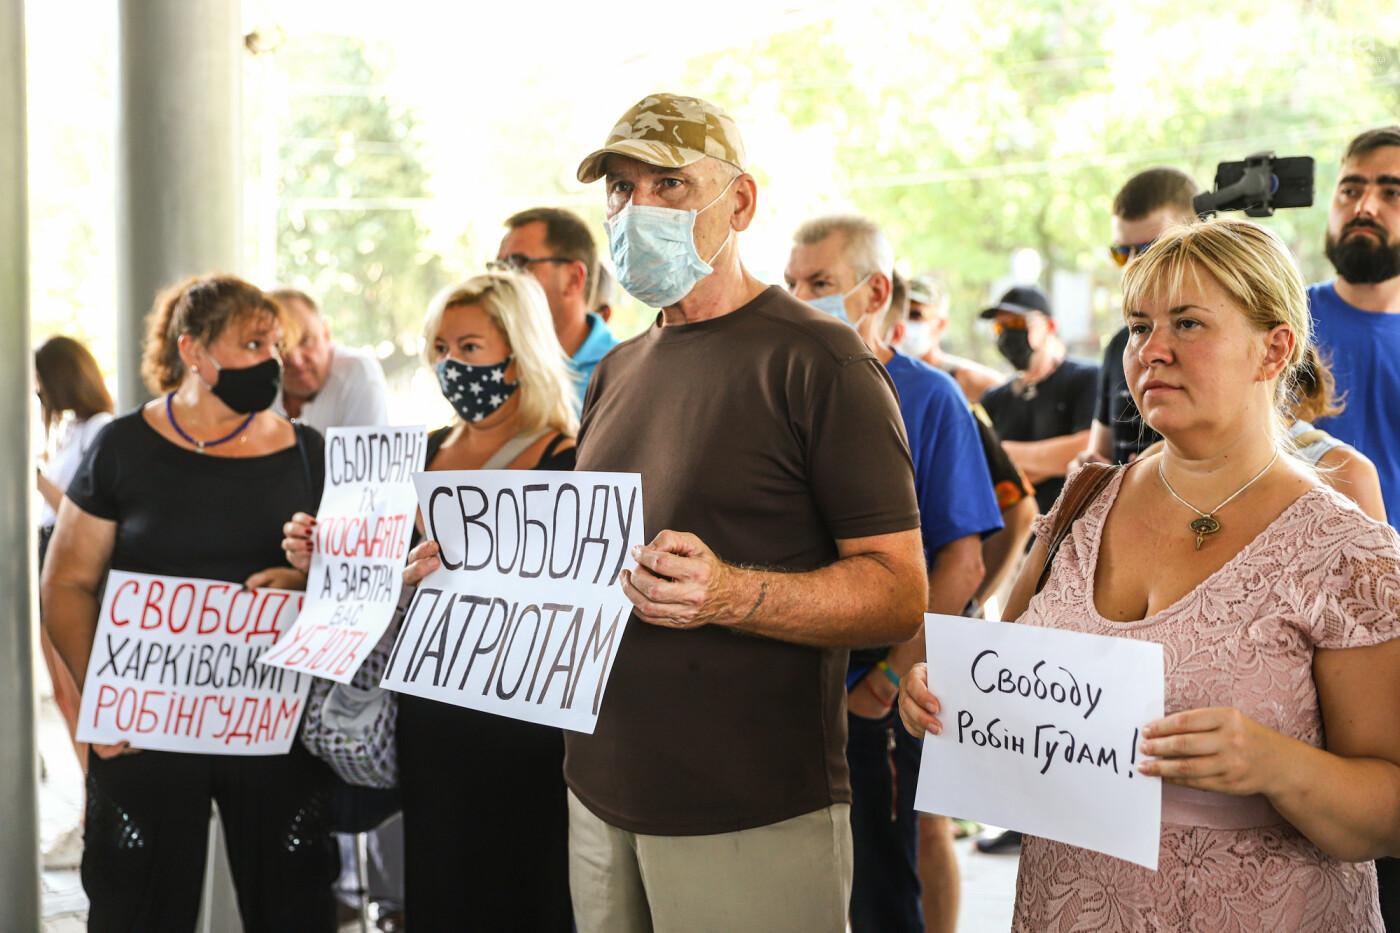 """Захист країни - не злочин"": в Запорожье патриоты провели митинг у стен нацполиции, - ФОТОРЕПОРТАЖ , фото-9"